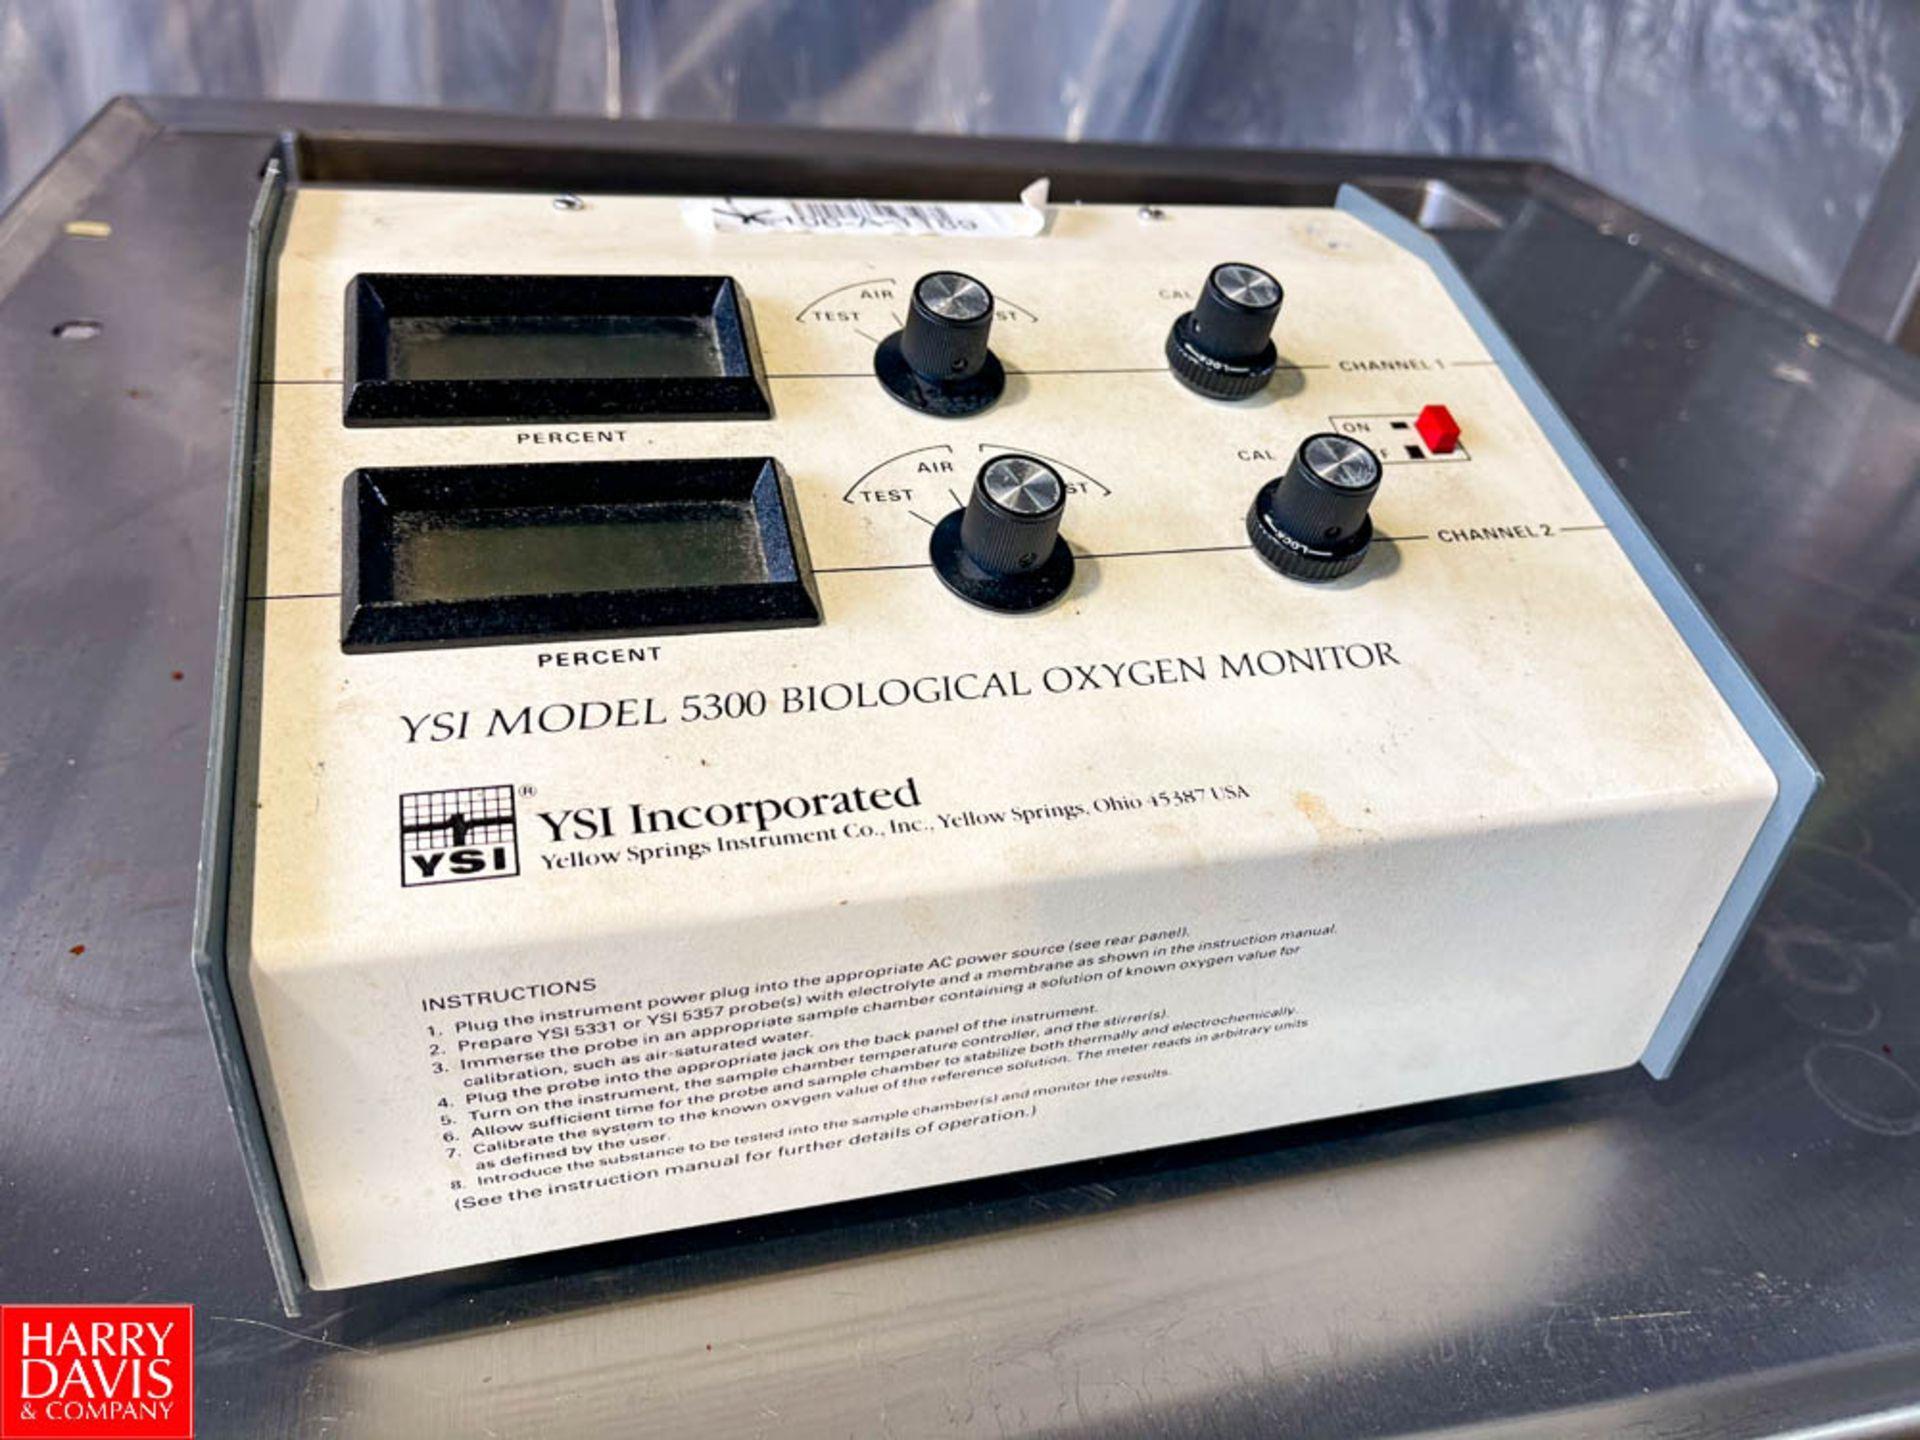 YSI Biological Oxygen Monitor Model 5300